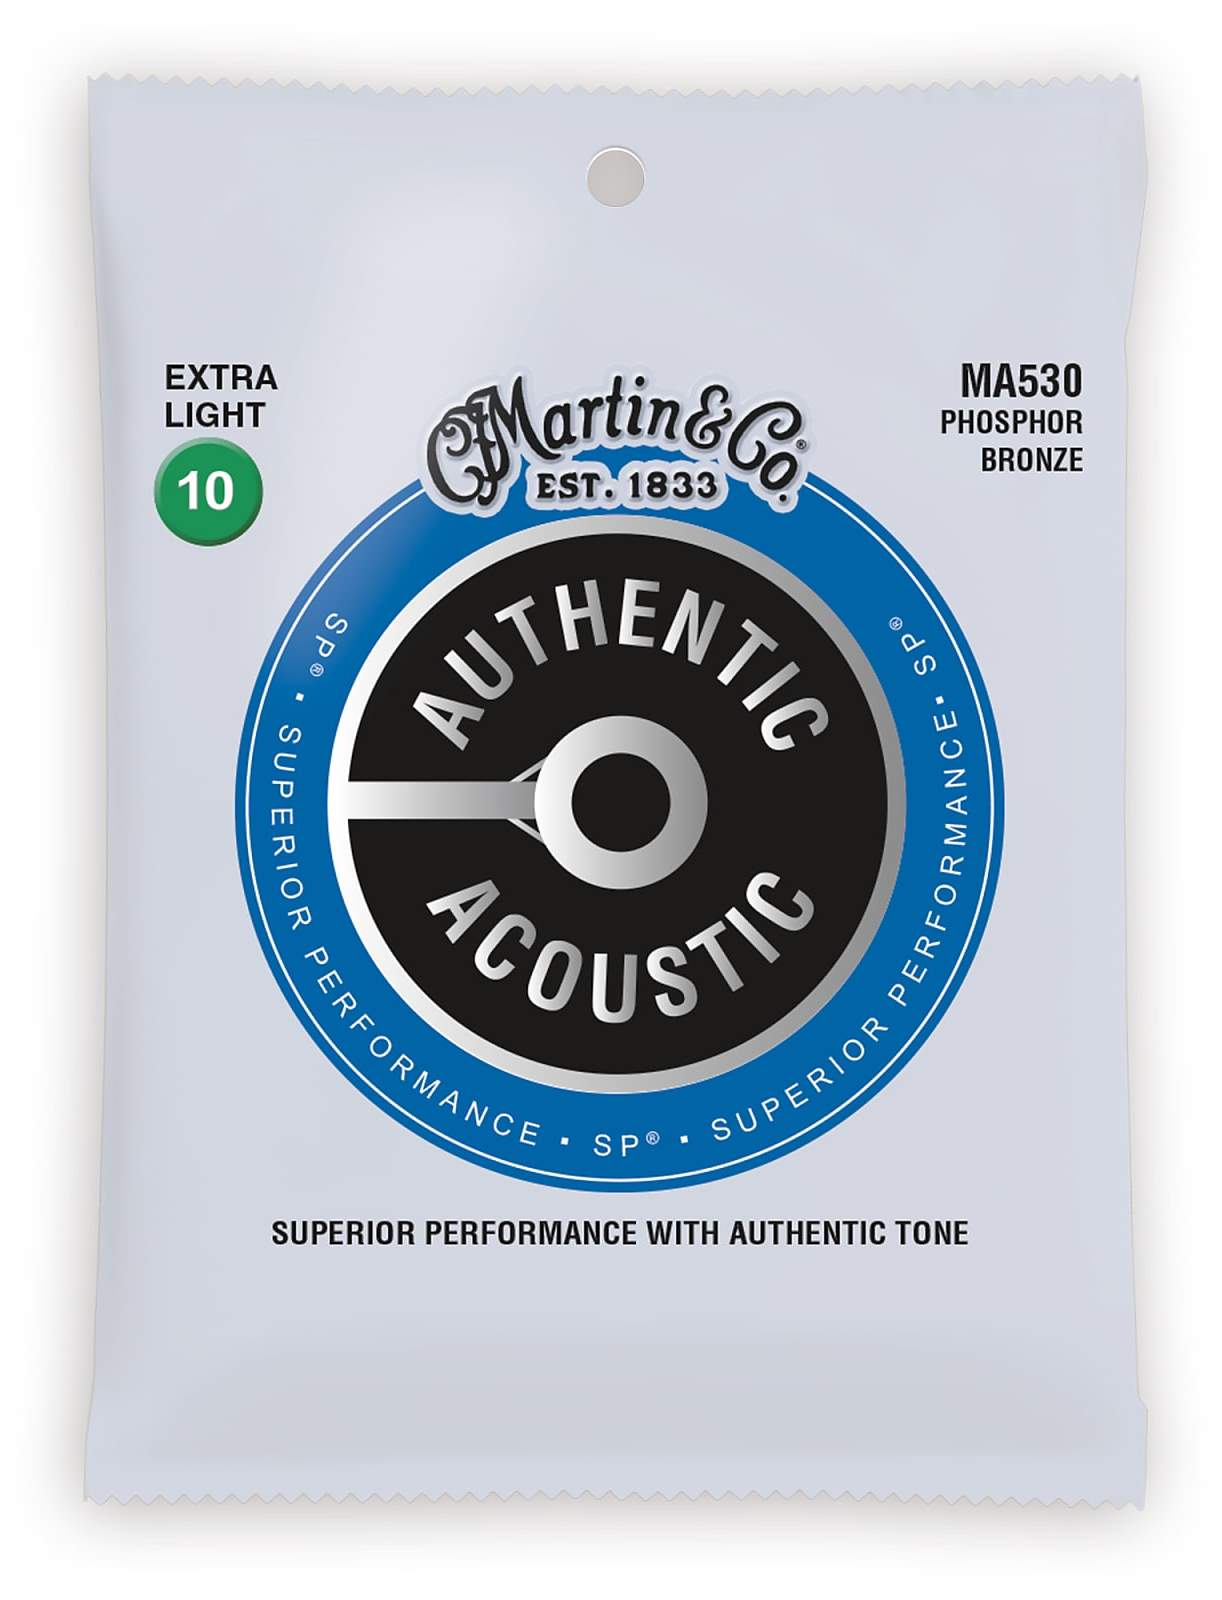 Martin Guitars MARTIN Authentic SP 92/8 Phosphor Bronze Extra Light